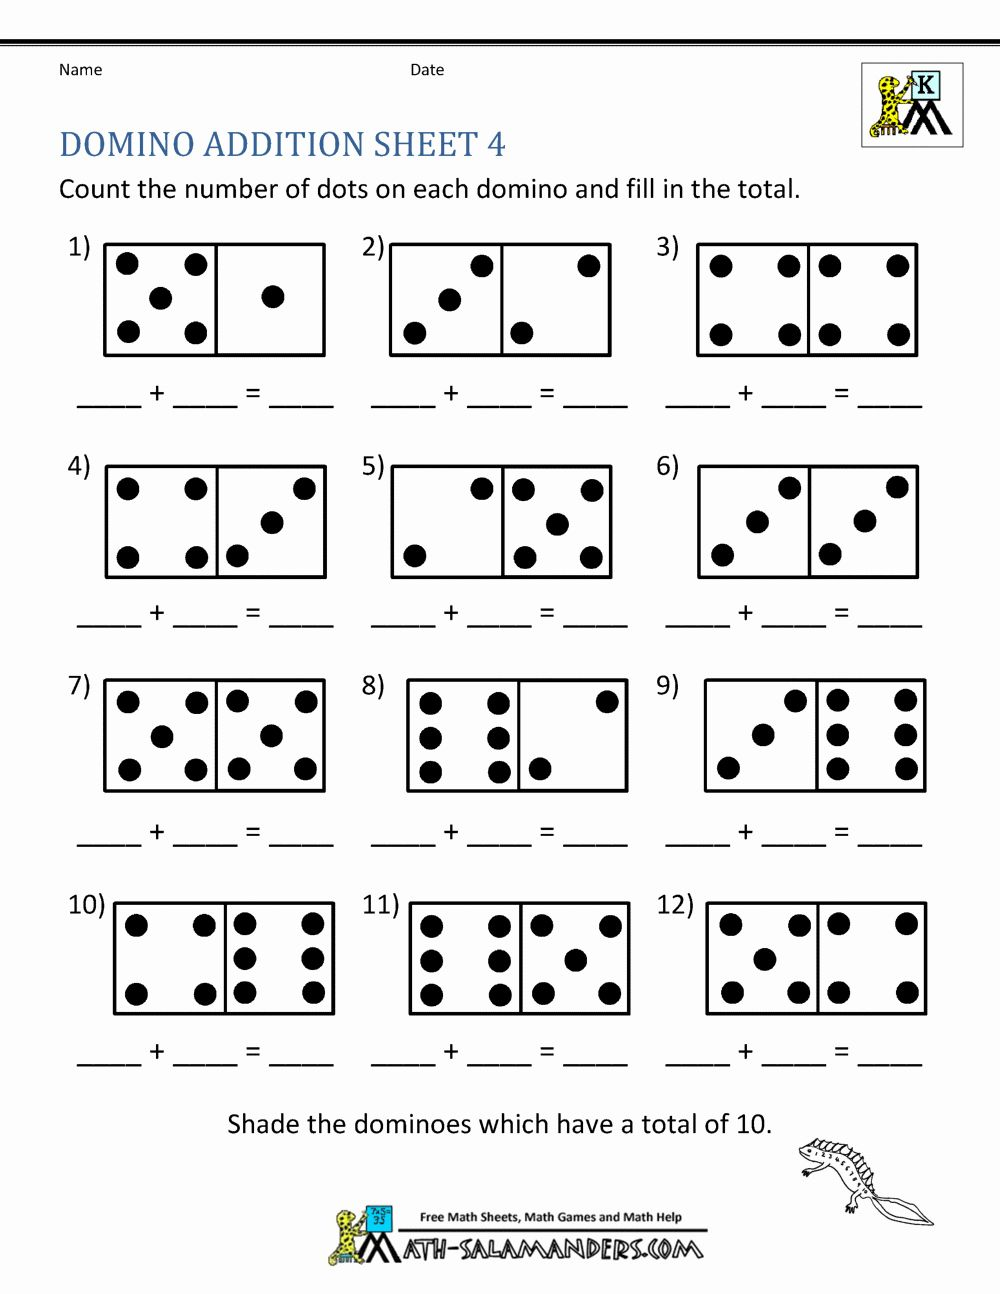 Worksheet For Kindergarten Math Addition Atividades Para Educacao Infantil Matematica Pre Escolar Educacao Infantil Addition worksheets using dominoes